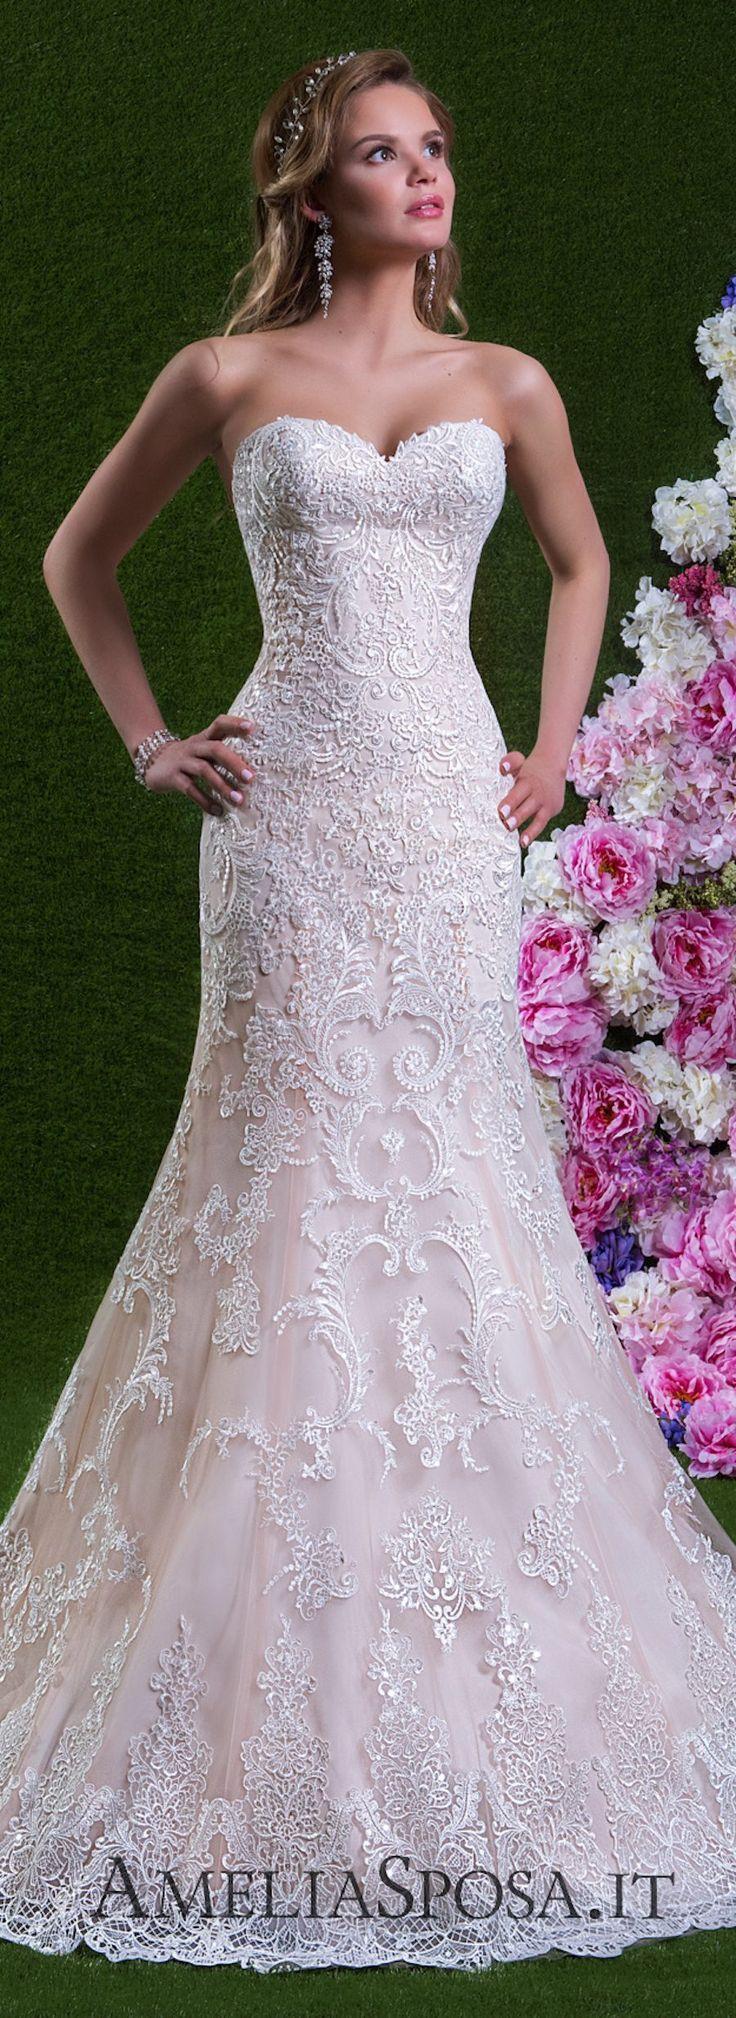 Wedding dresses illustration description amelia sposa wedding dress